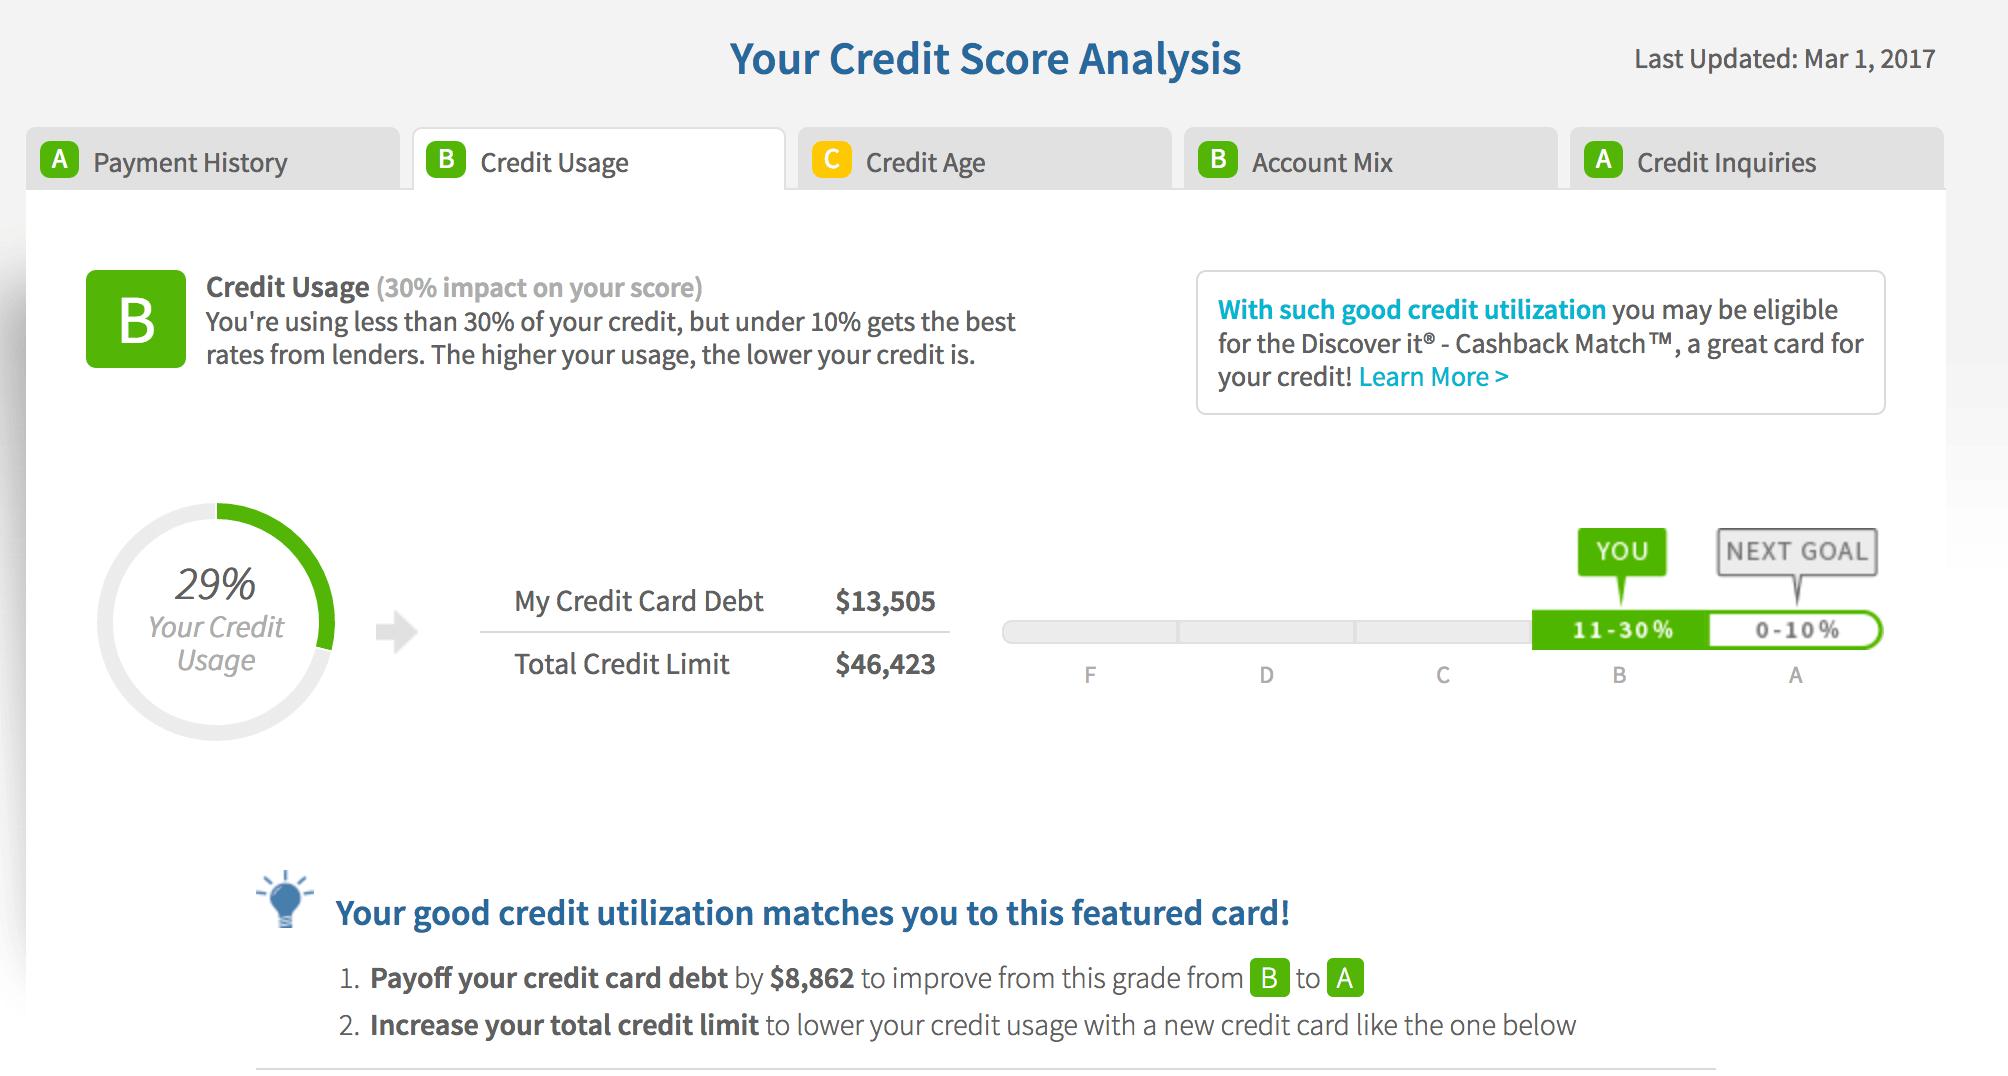 CreditUsage